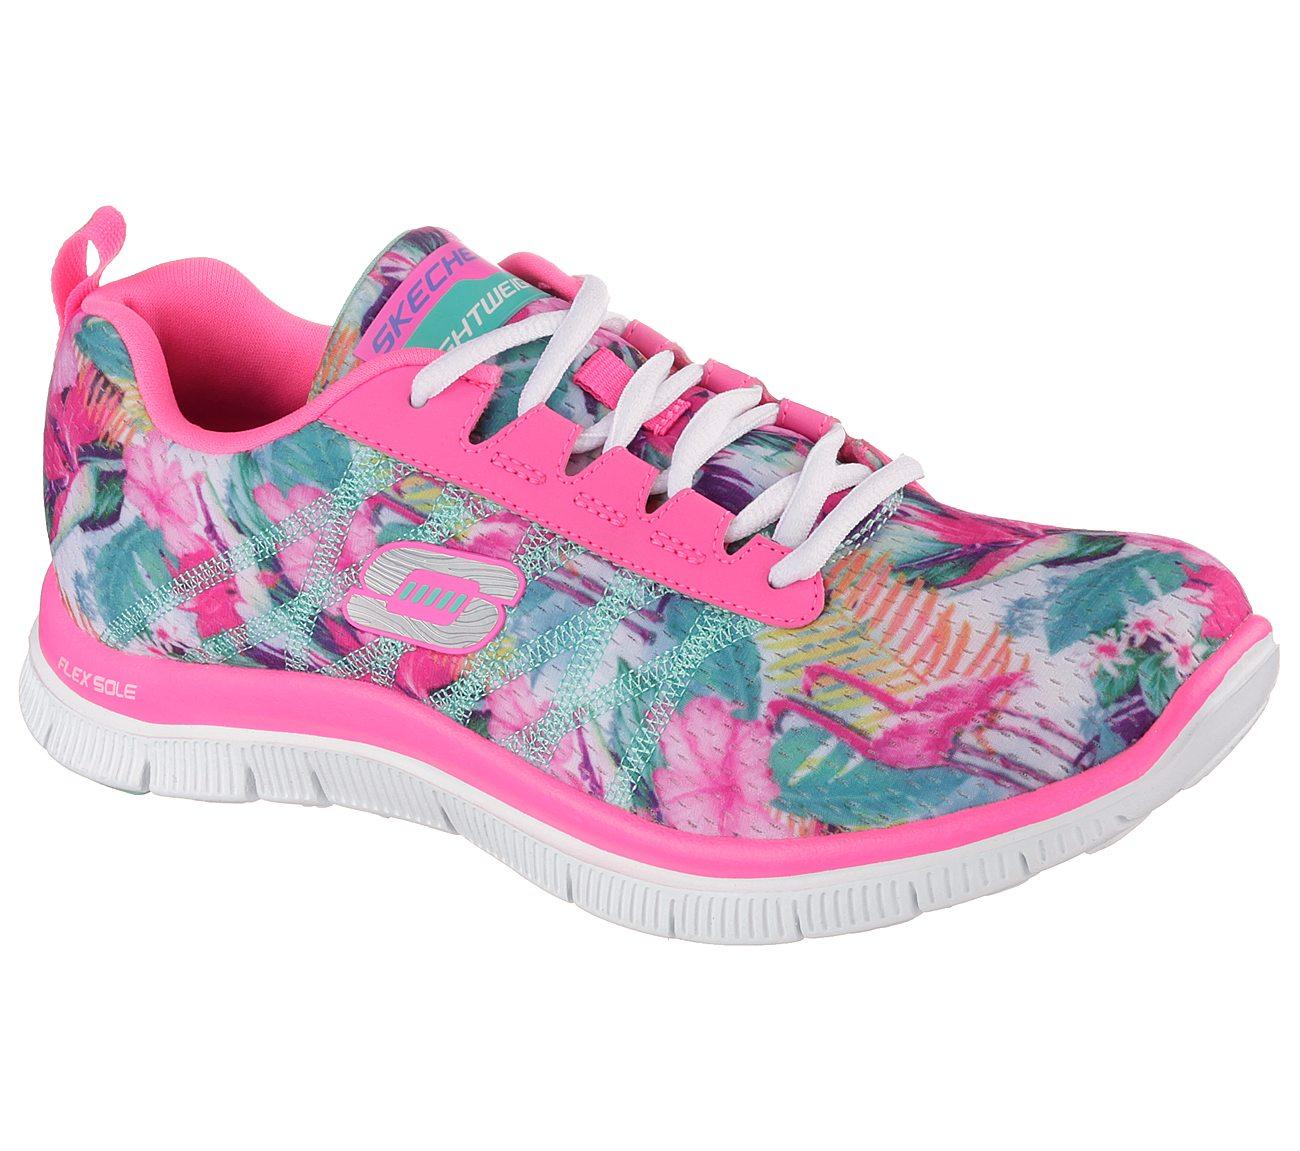 5f16eebb52bf Buy SKECHERS Flex Appeal - Floral Bloom Flex Appeal Shoes only  40.00